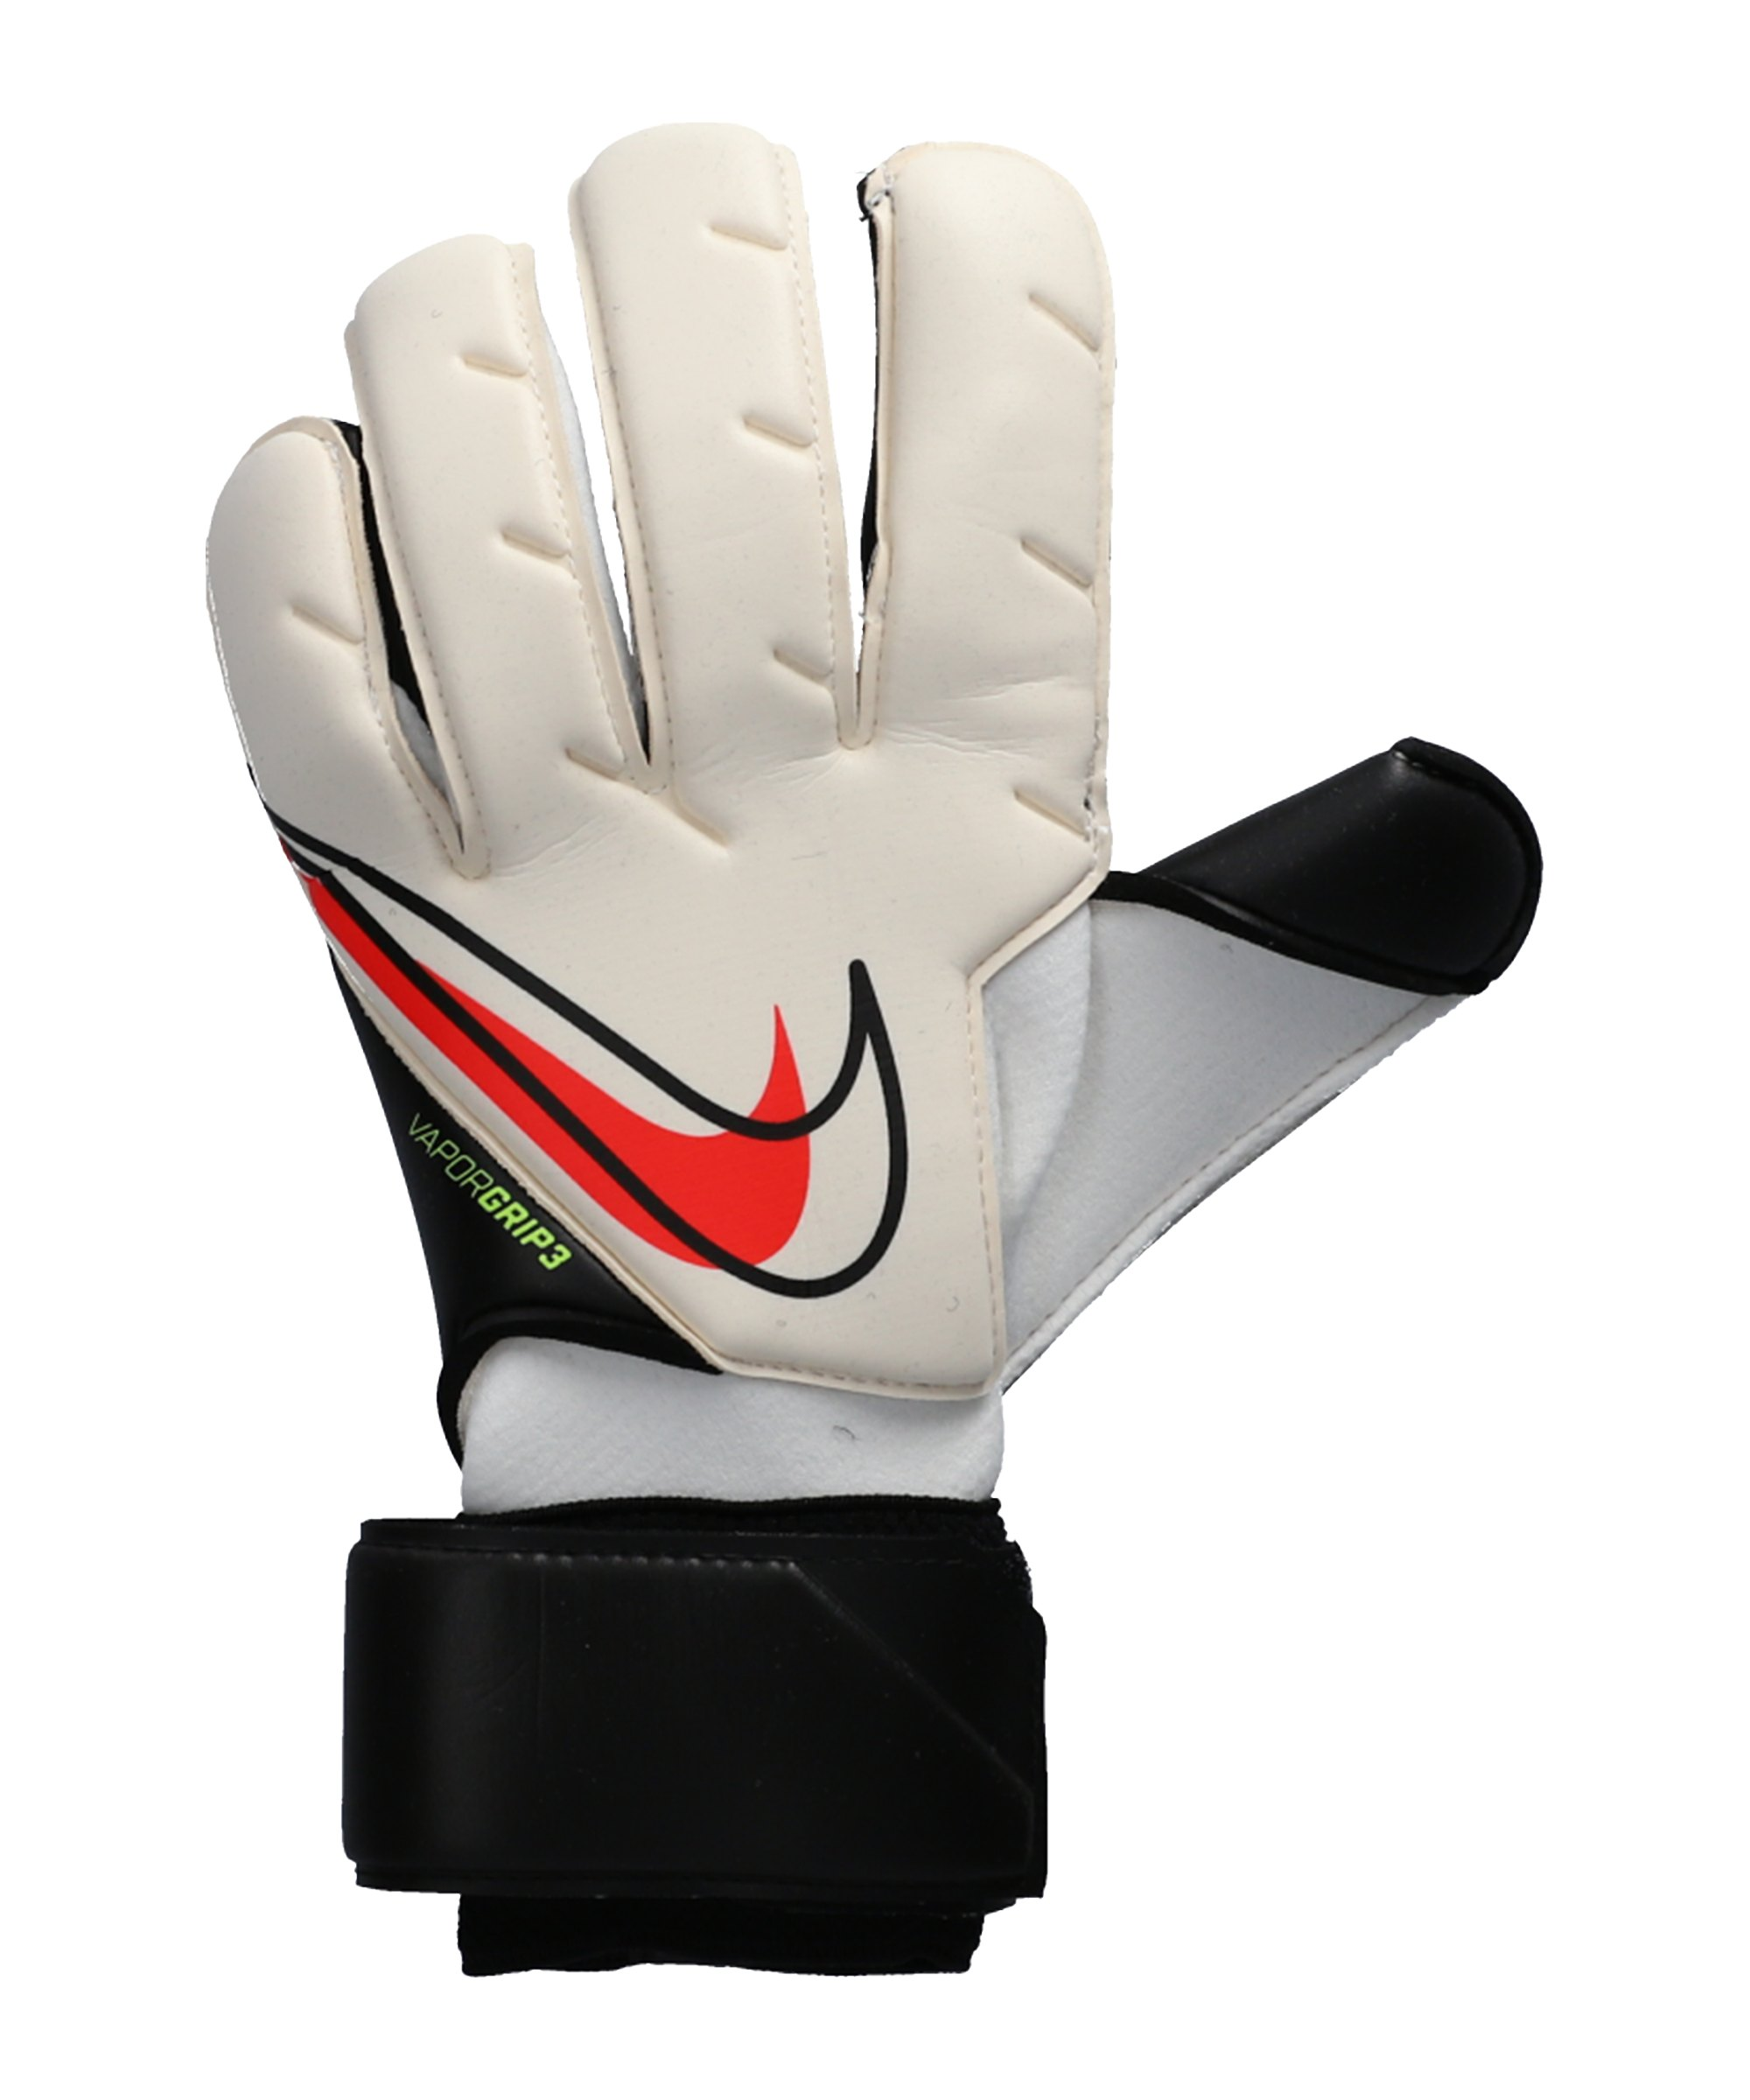 Nike VG3 RS Promo TW-Handschuhe Weiss Schwarz Rot F100 - weiss